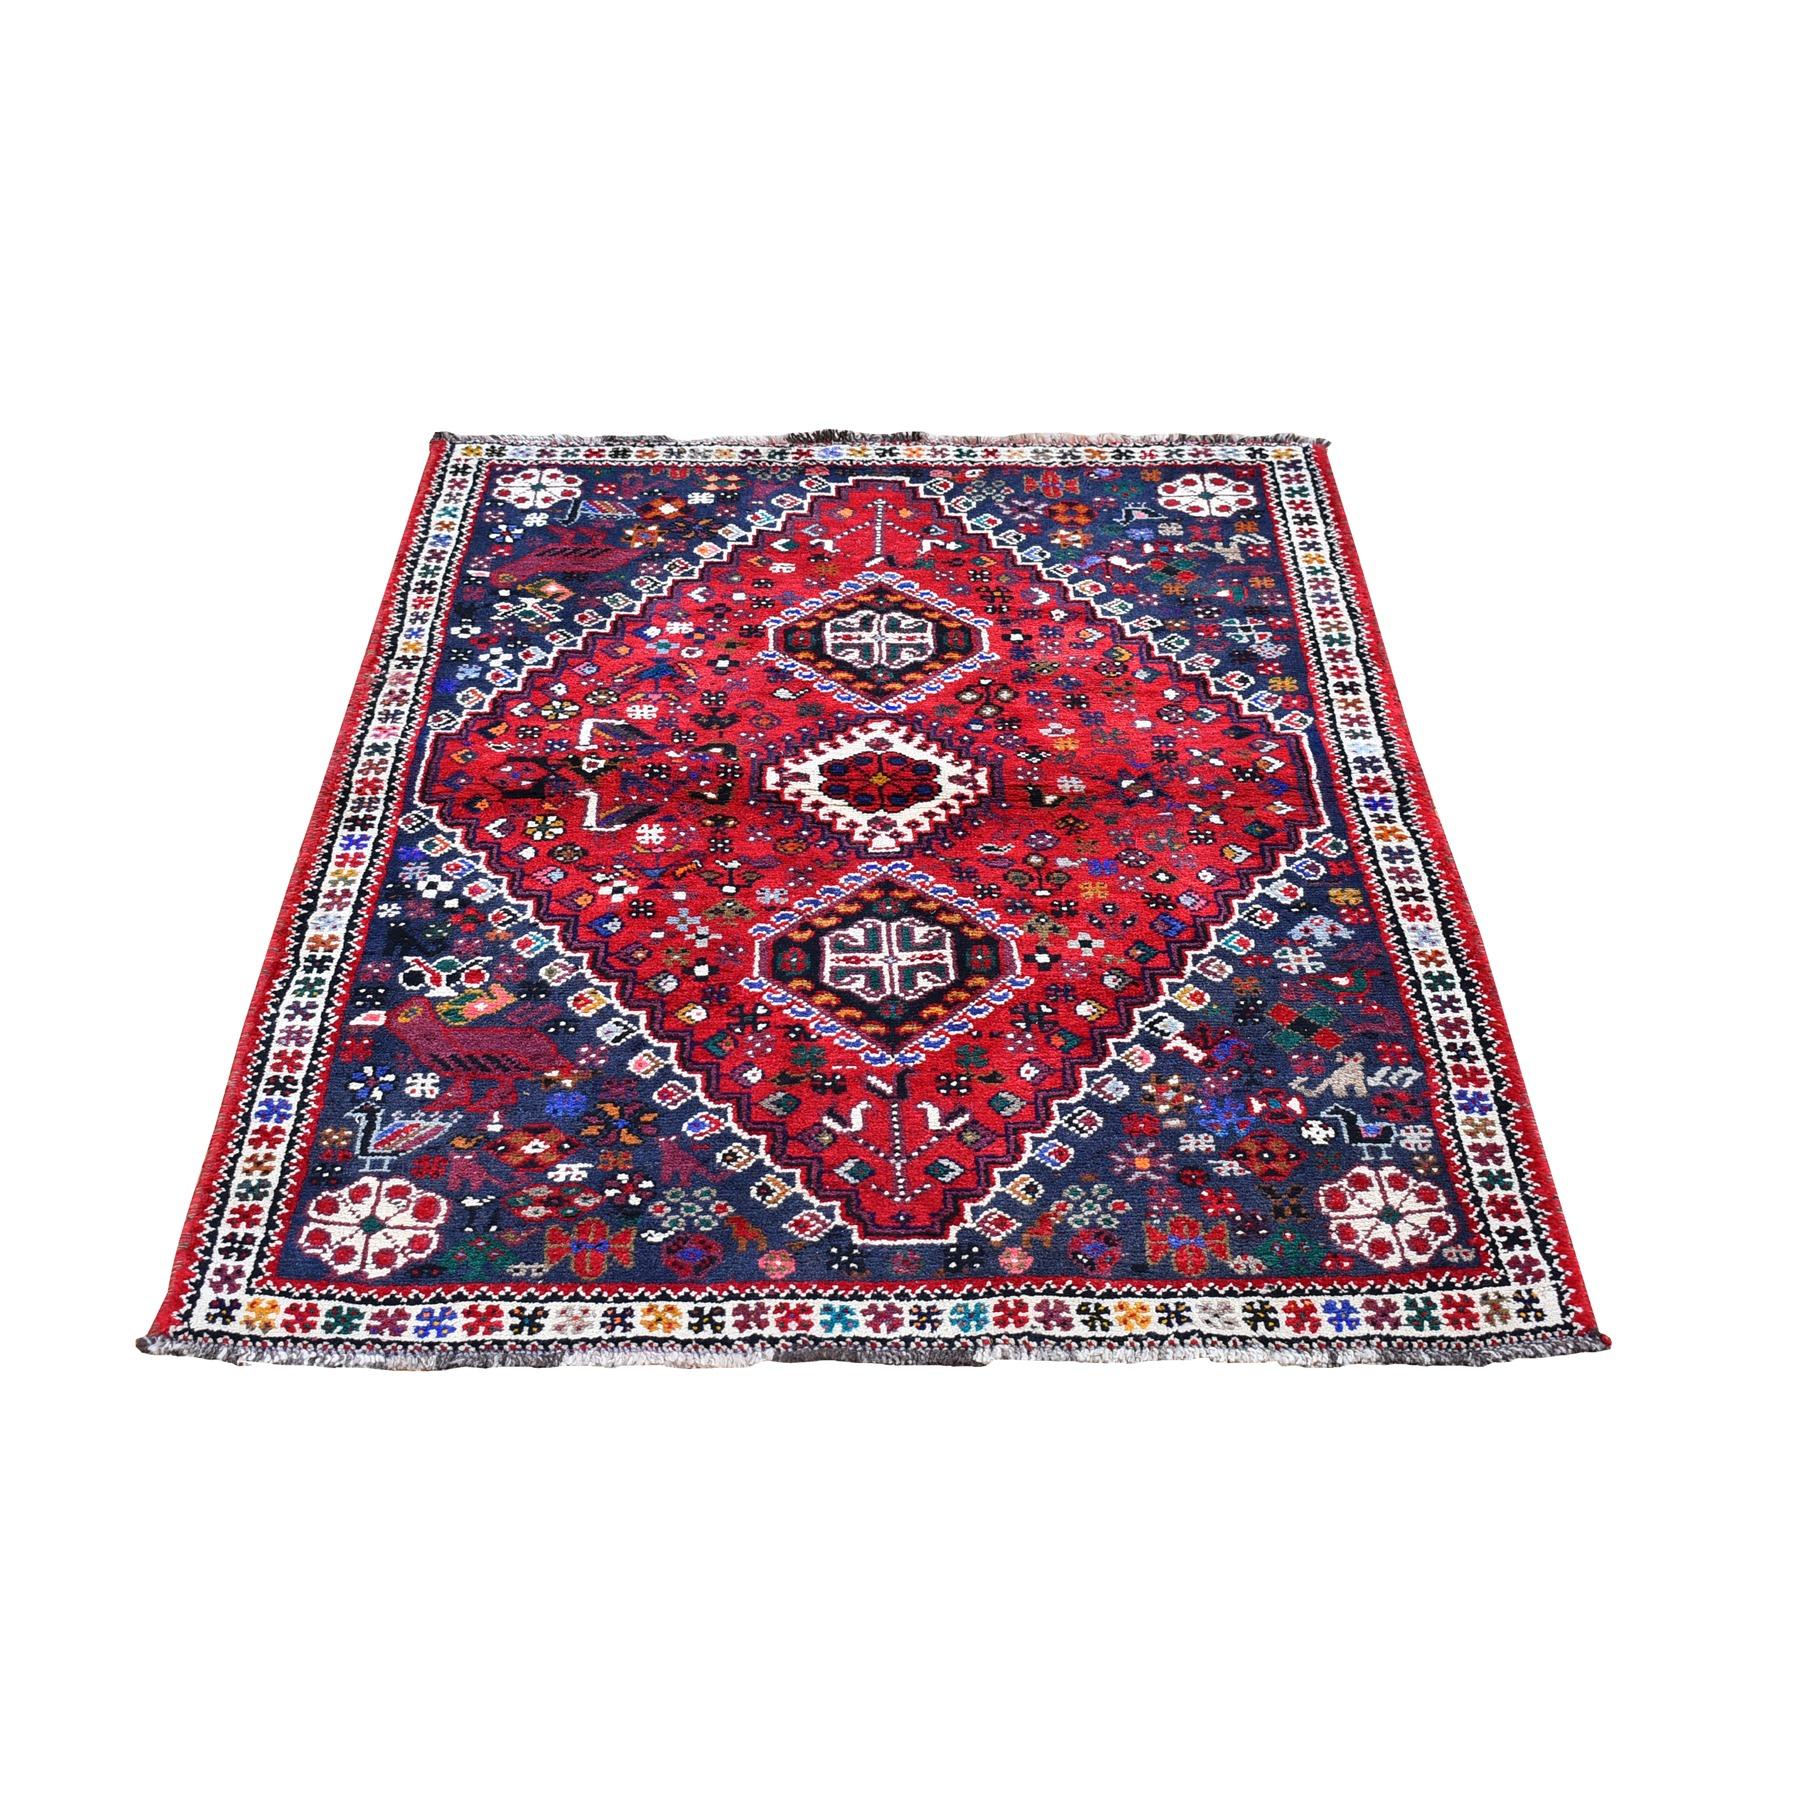 "3'10""x5'5"" New Persian Shiraz Red Organic Wool Geometric Design Hand Knotted Oriental Rug"